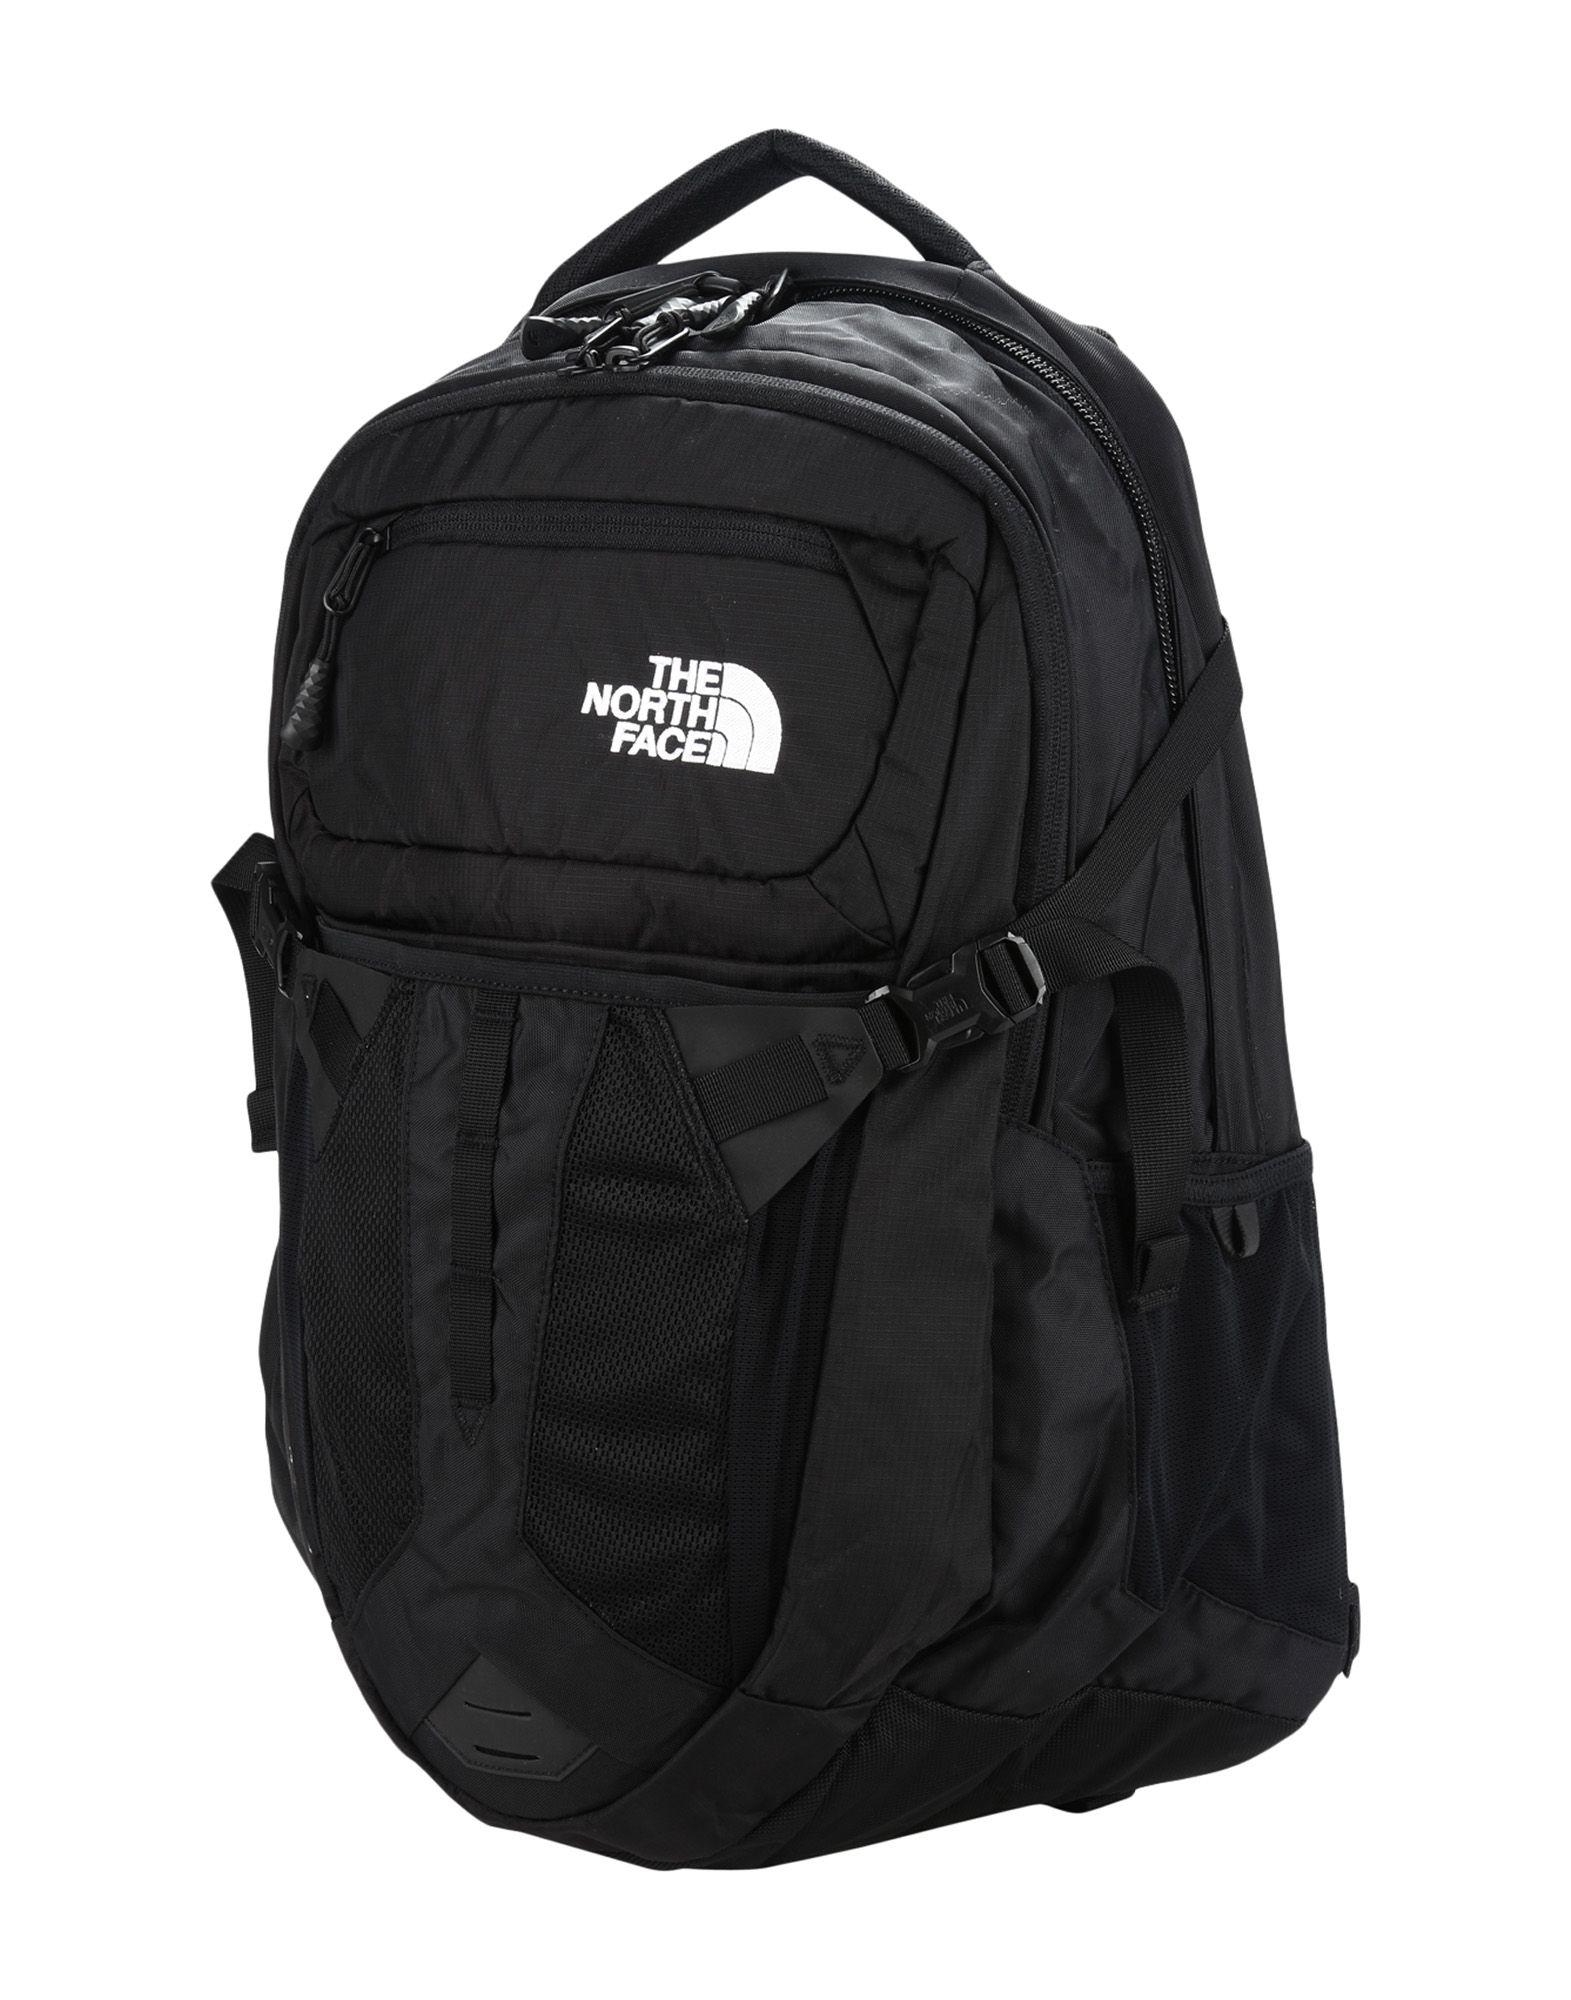 THE NORTH FACE Рюкзаки и сумки на пояс the cambridge satchel company рюкзаки и сумки на пояс